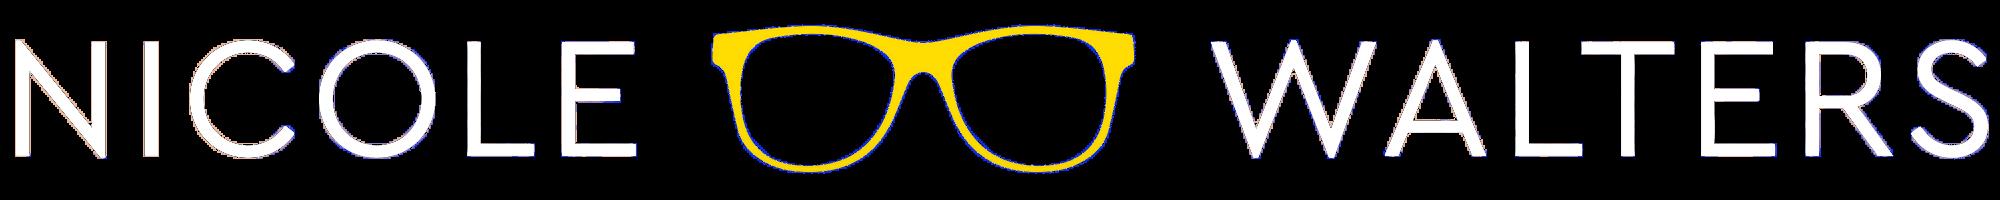 nicole-walters-word-logo